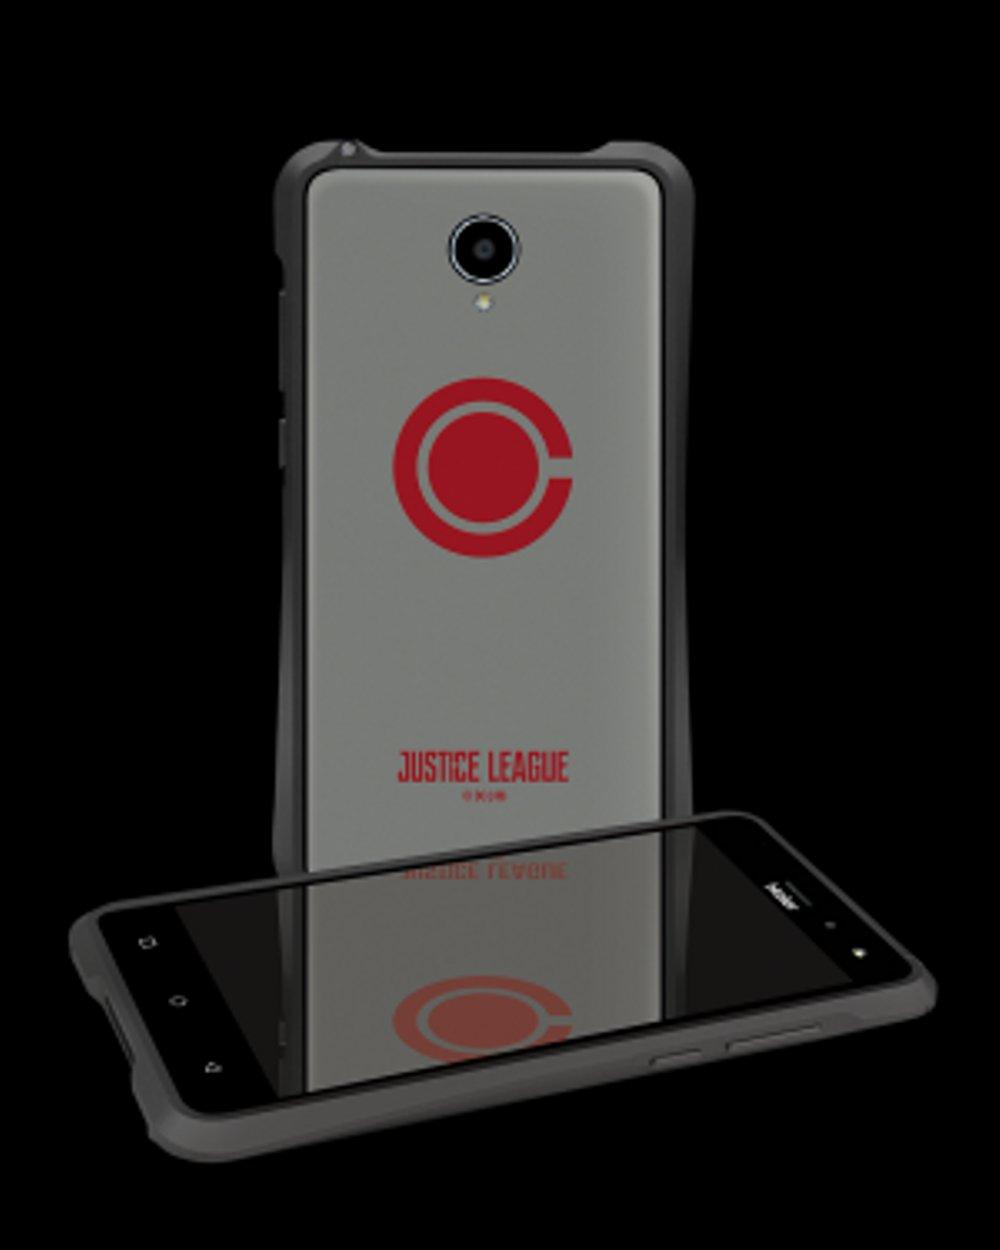 HAIER SMARTPHONE G7 CYBORG LIMITED